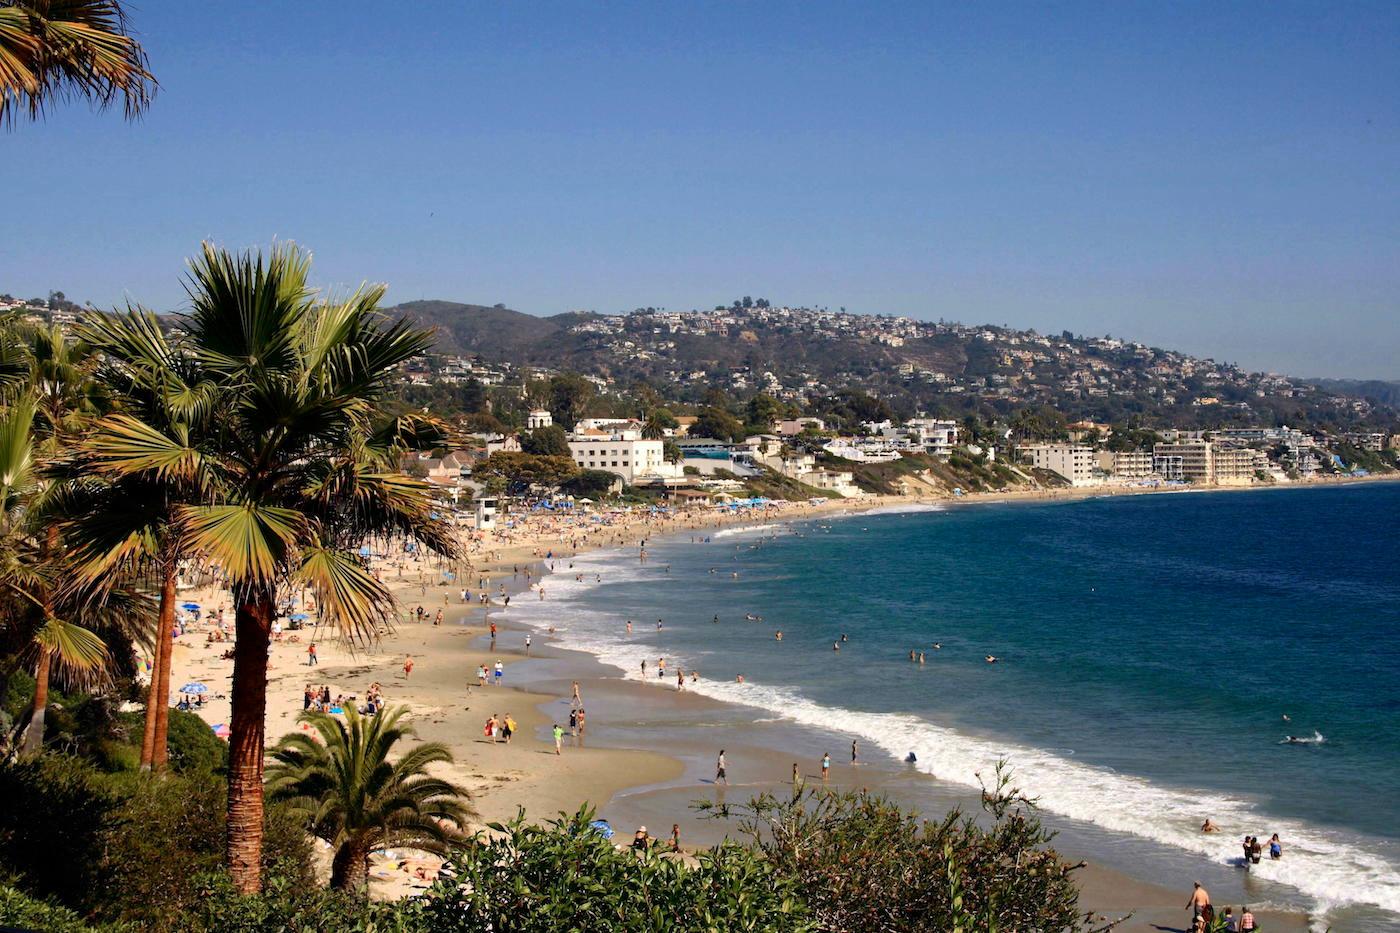 Laguna's Beaches and Coastline - 0.8 mile